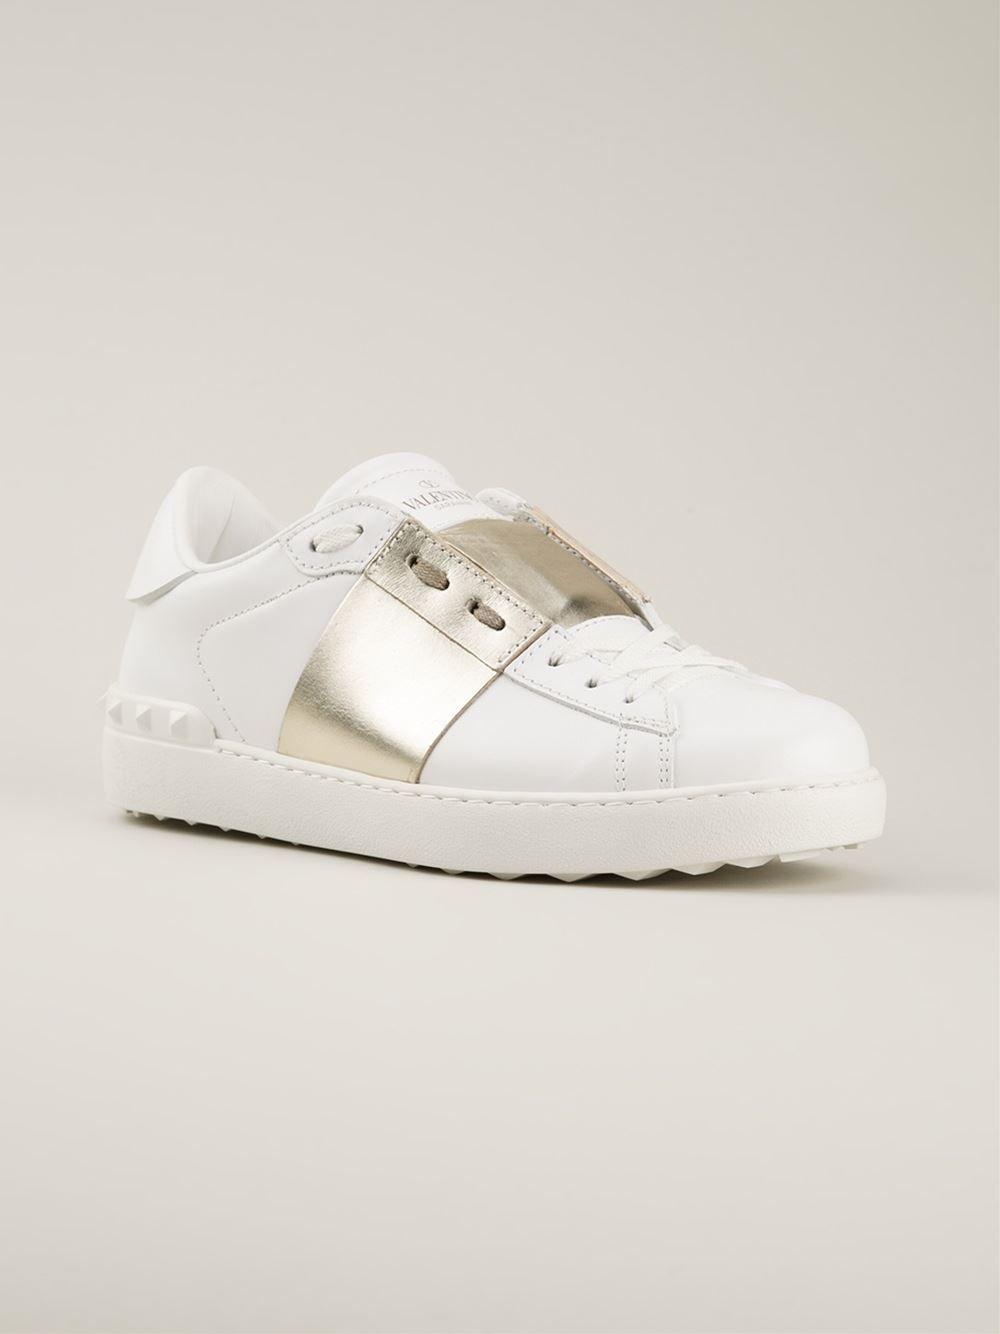 27a87d78022c Valentino Garavani  low Top Open  Sneakers - Hirshleifers - Farfetch ...